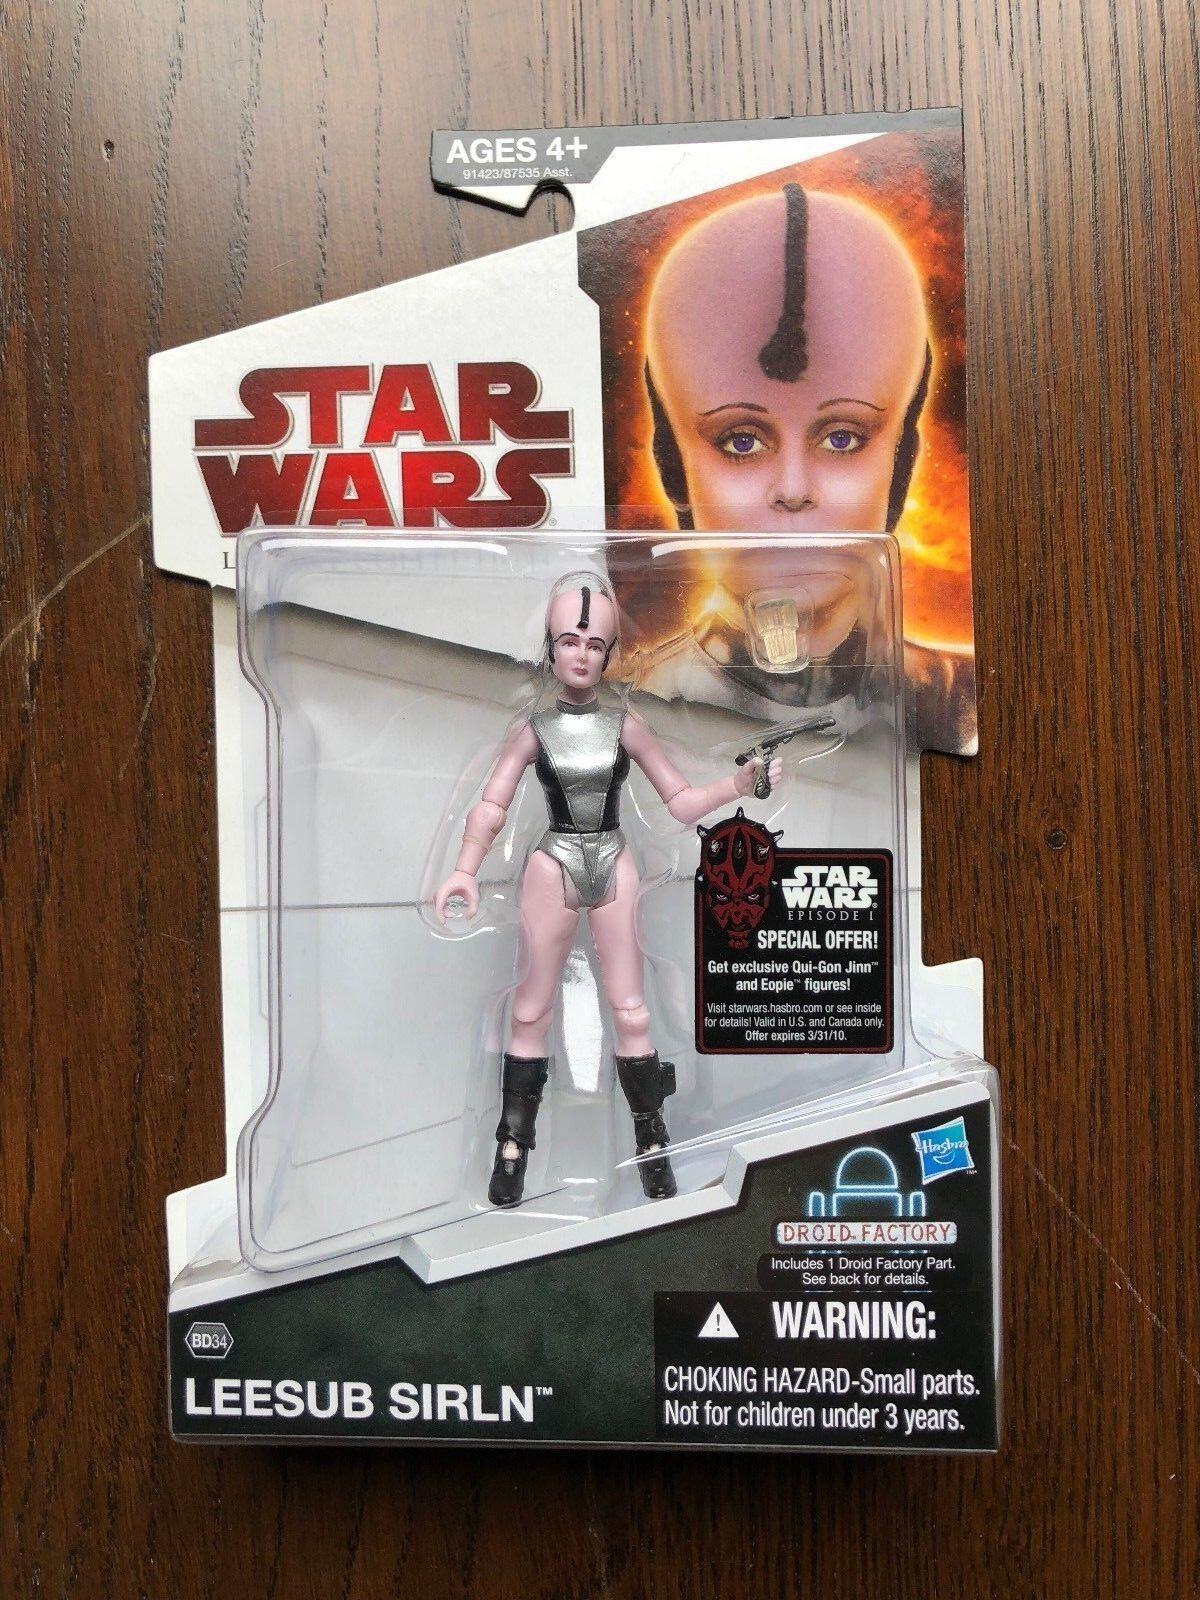 Hasbro 2009 Star Wars Legacy Collection Droid Factory Series - LEESUB SIRLN